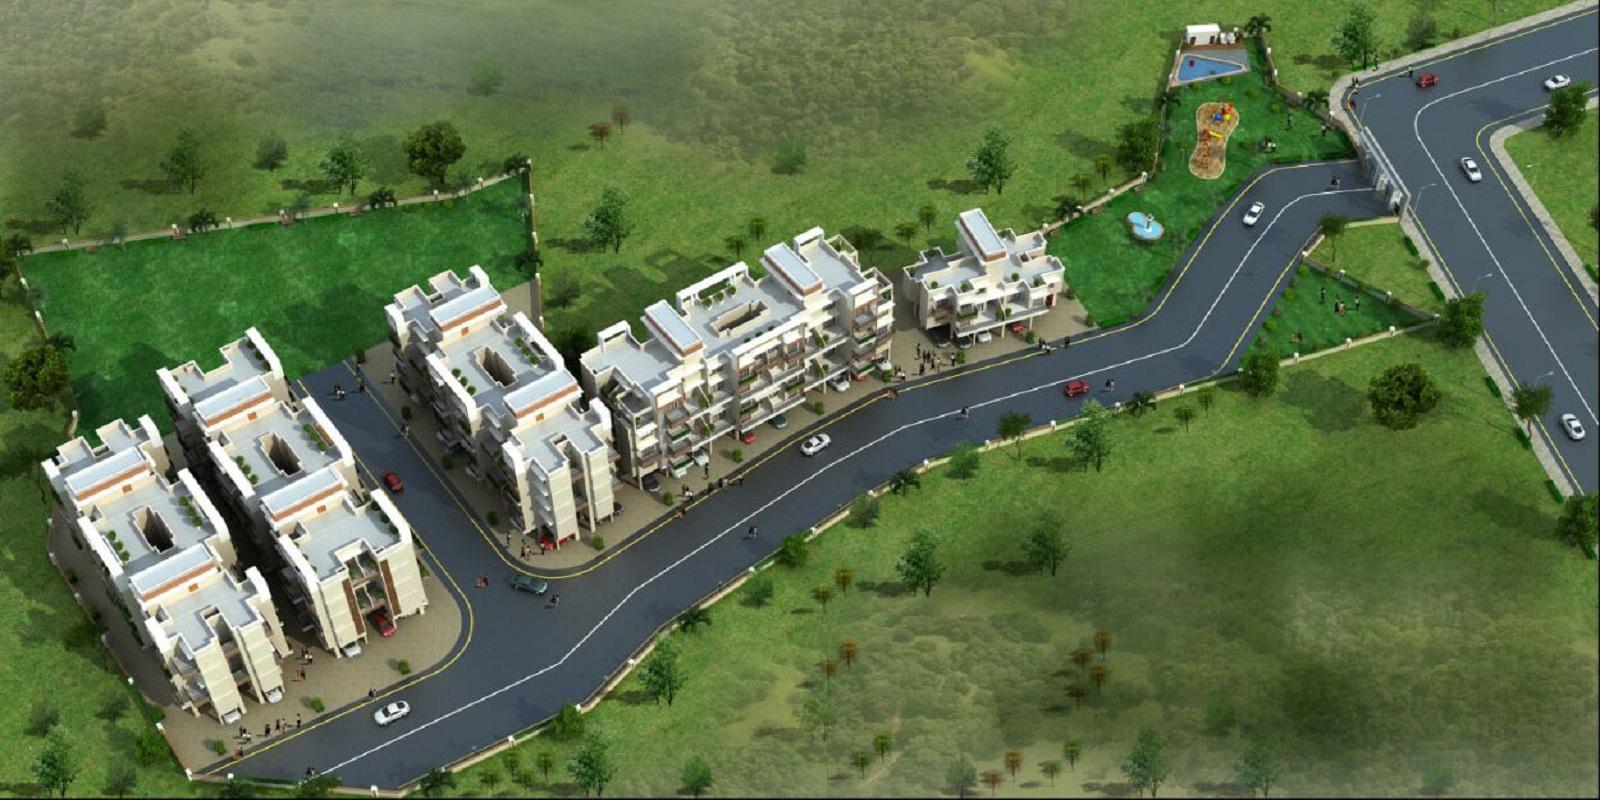 vijay abode project large image3